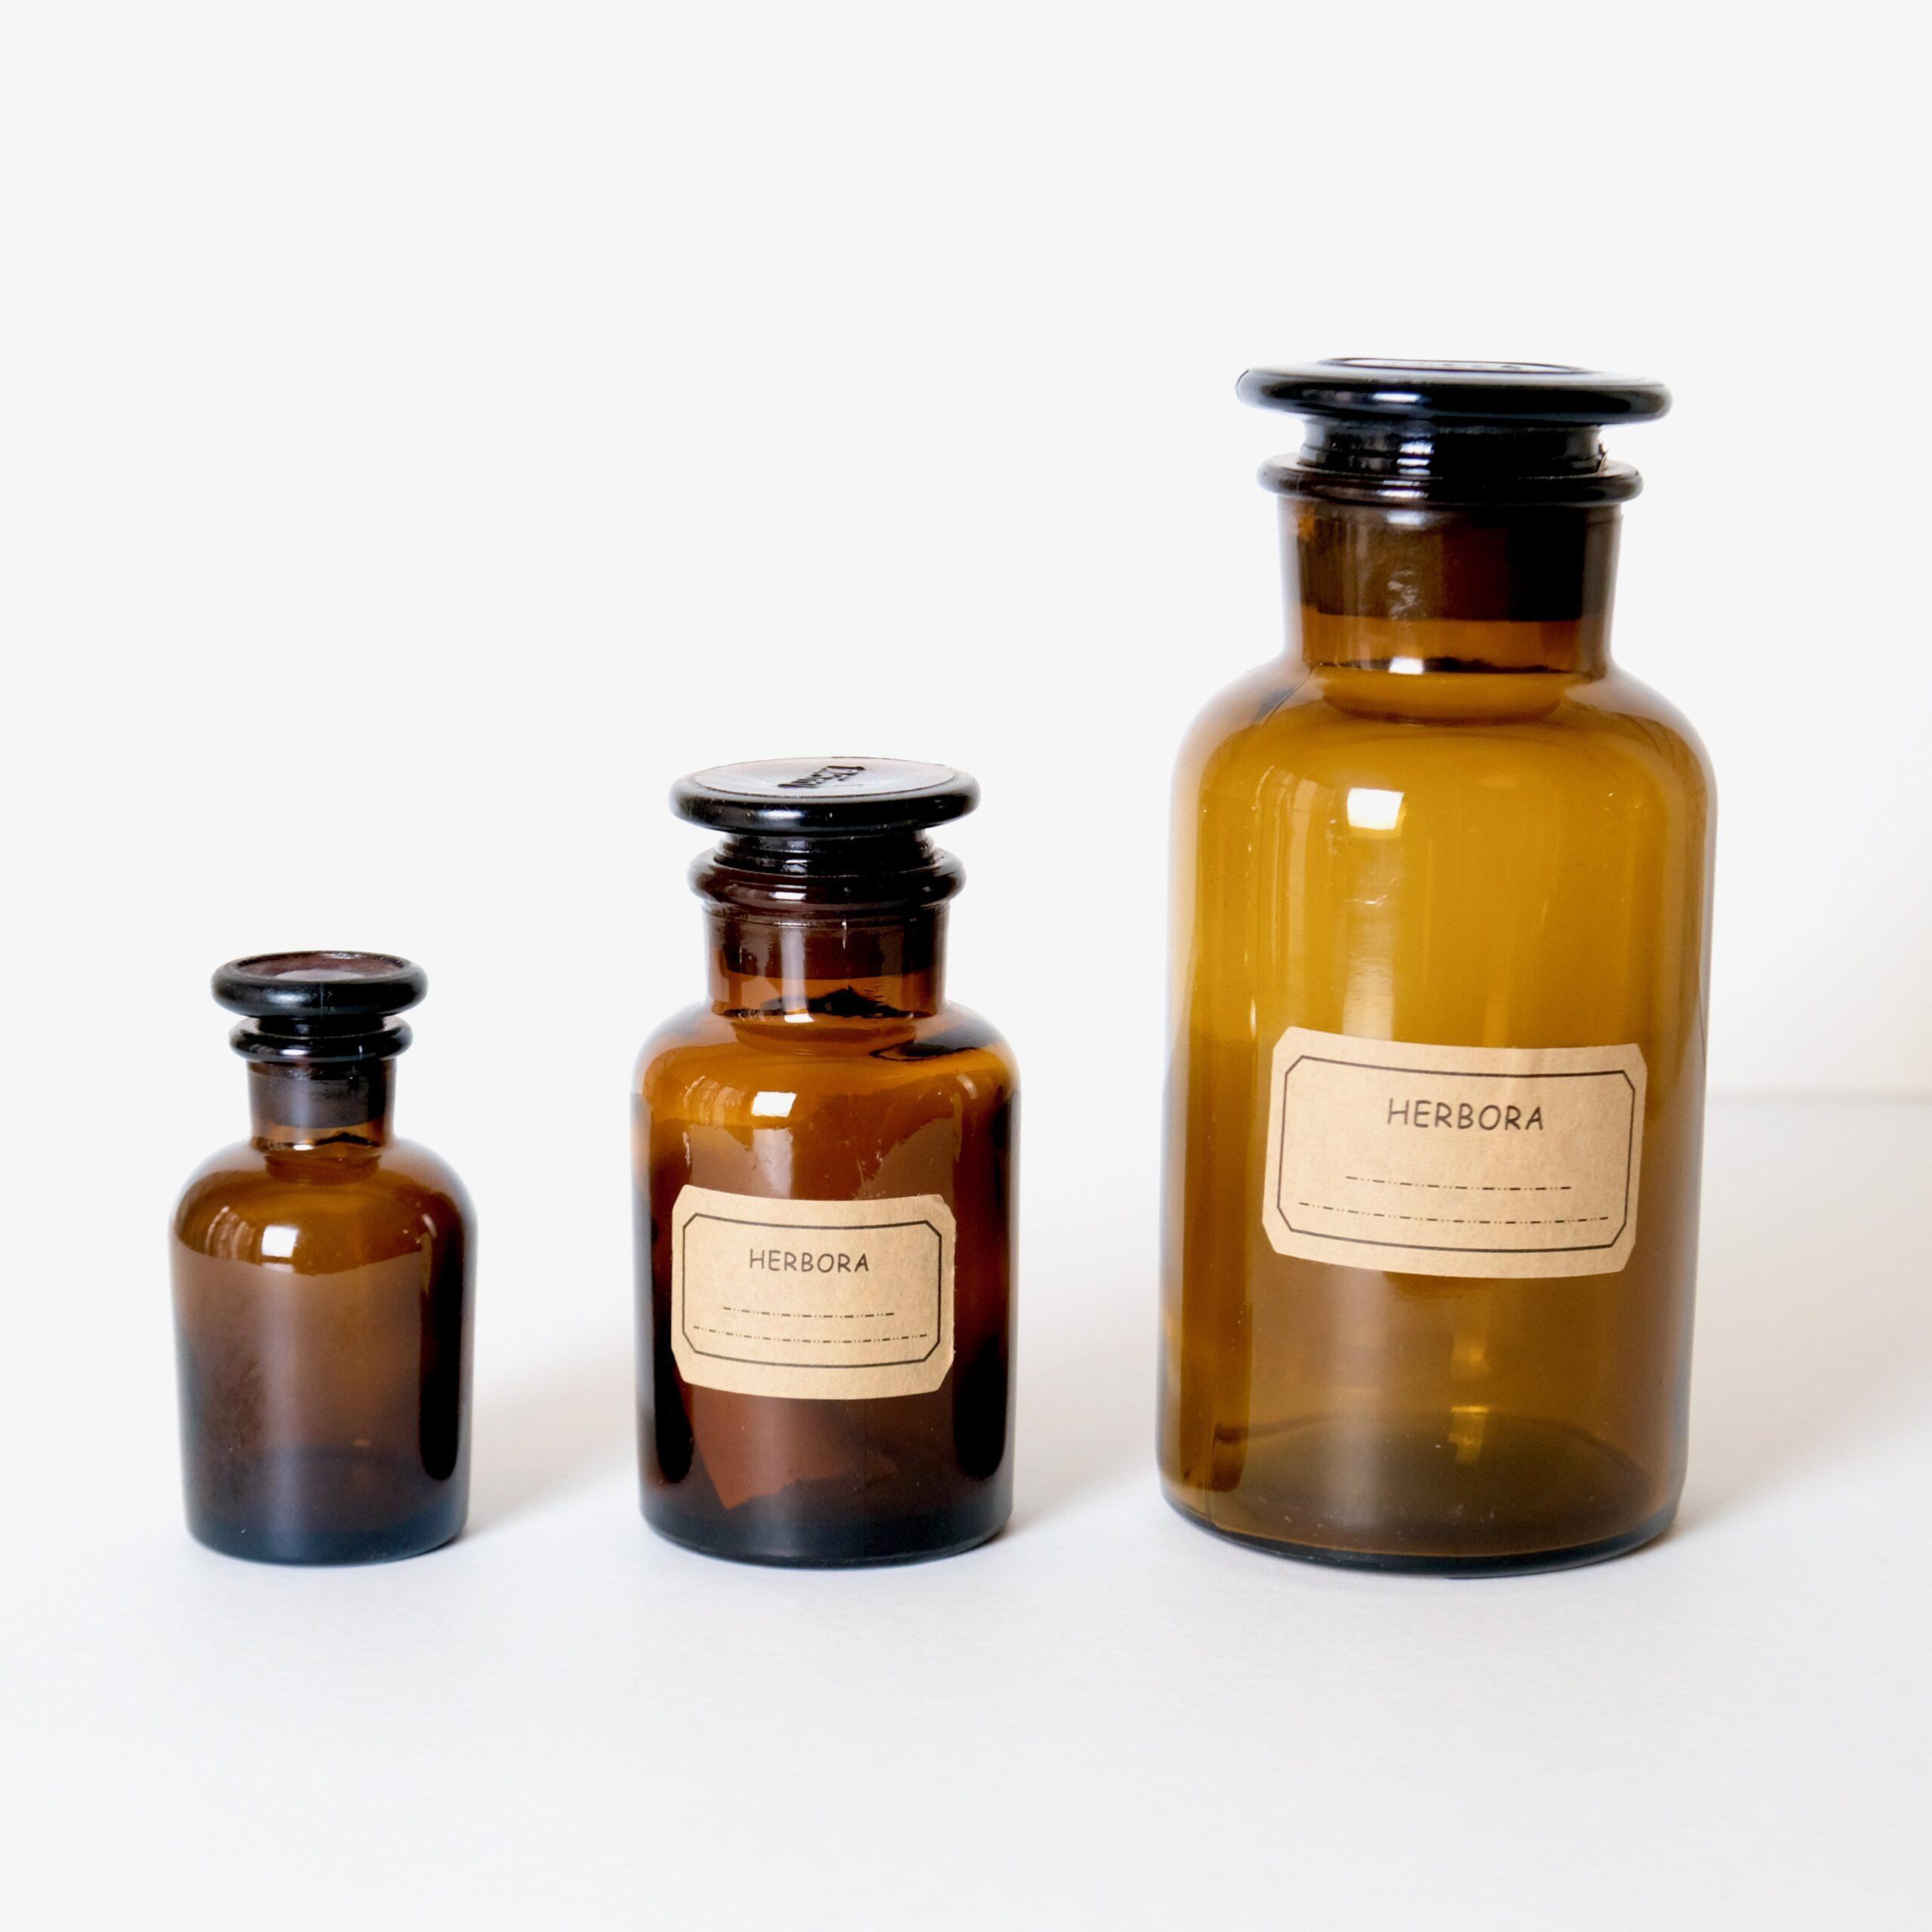 Fiole-fumée-trio-atelier-lavarenne-fleuriste-lyon